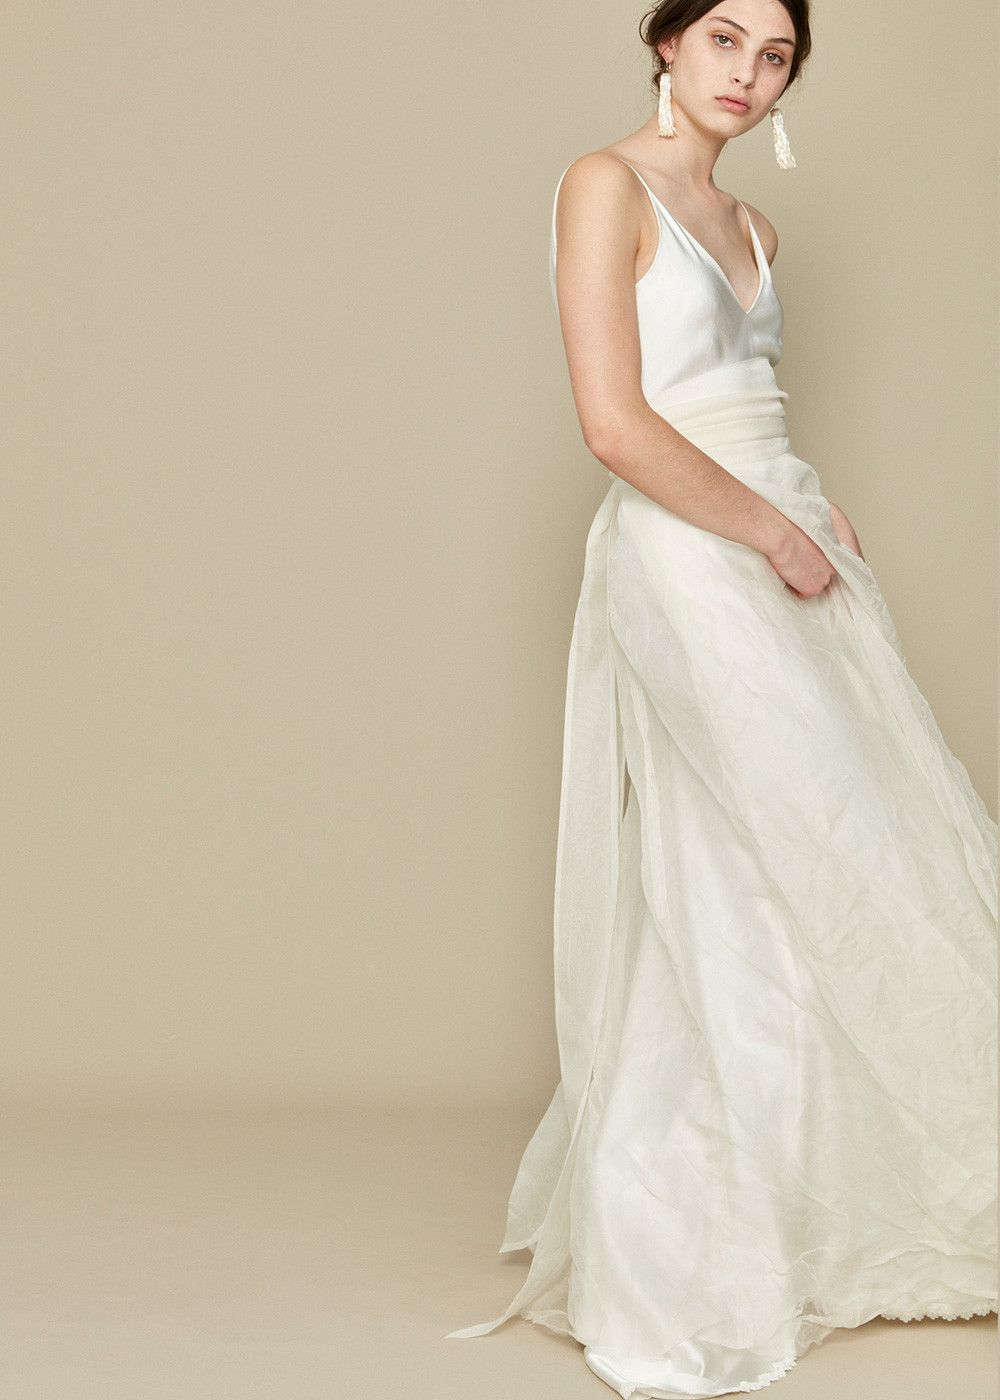 A la robe spina dress pinterest wedding dress and weddings